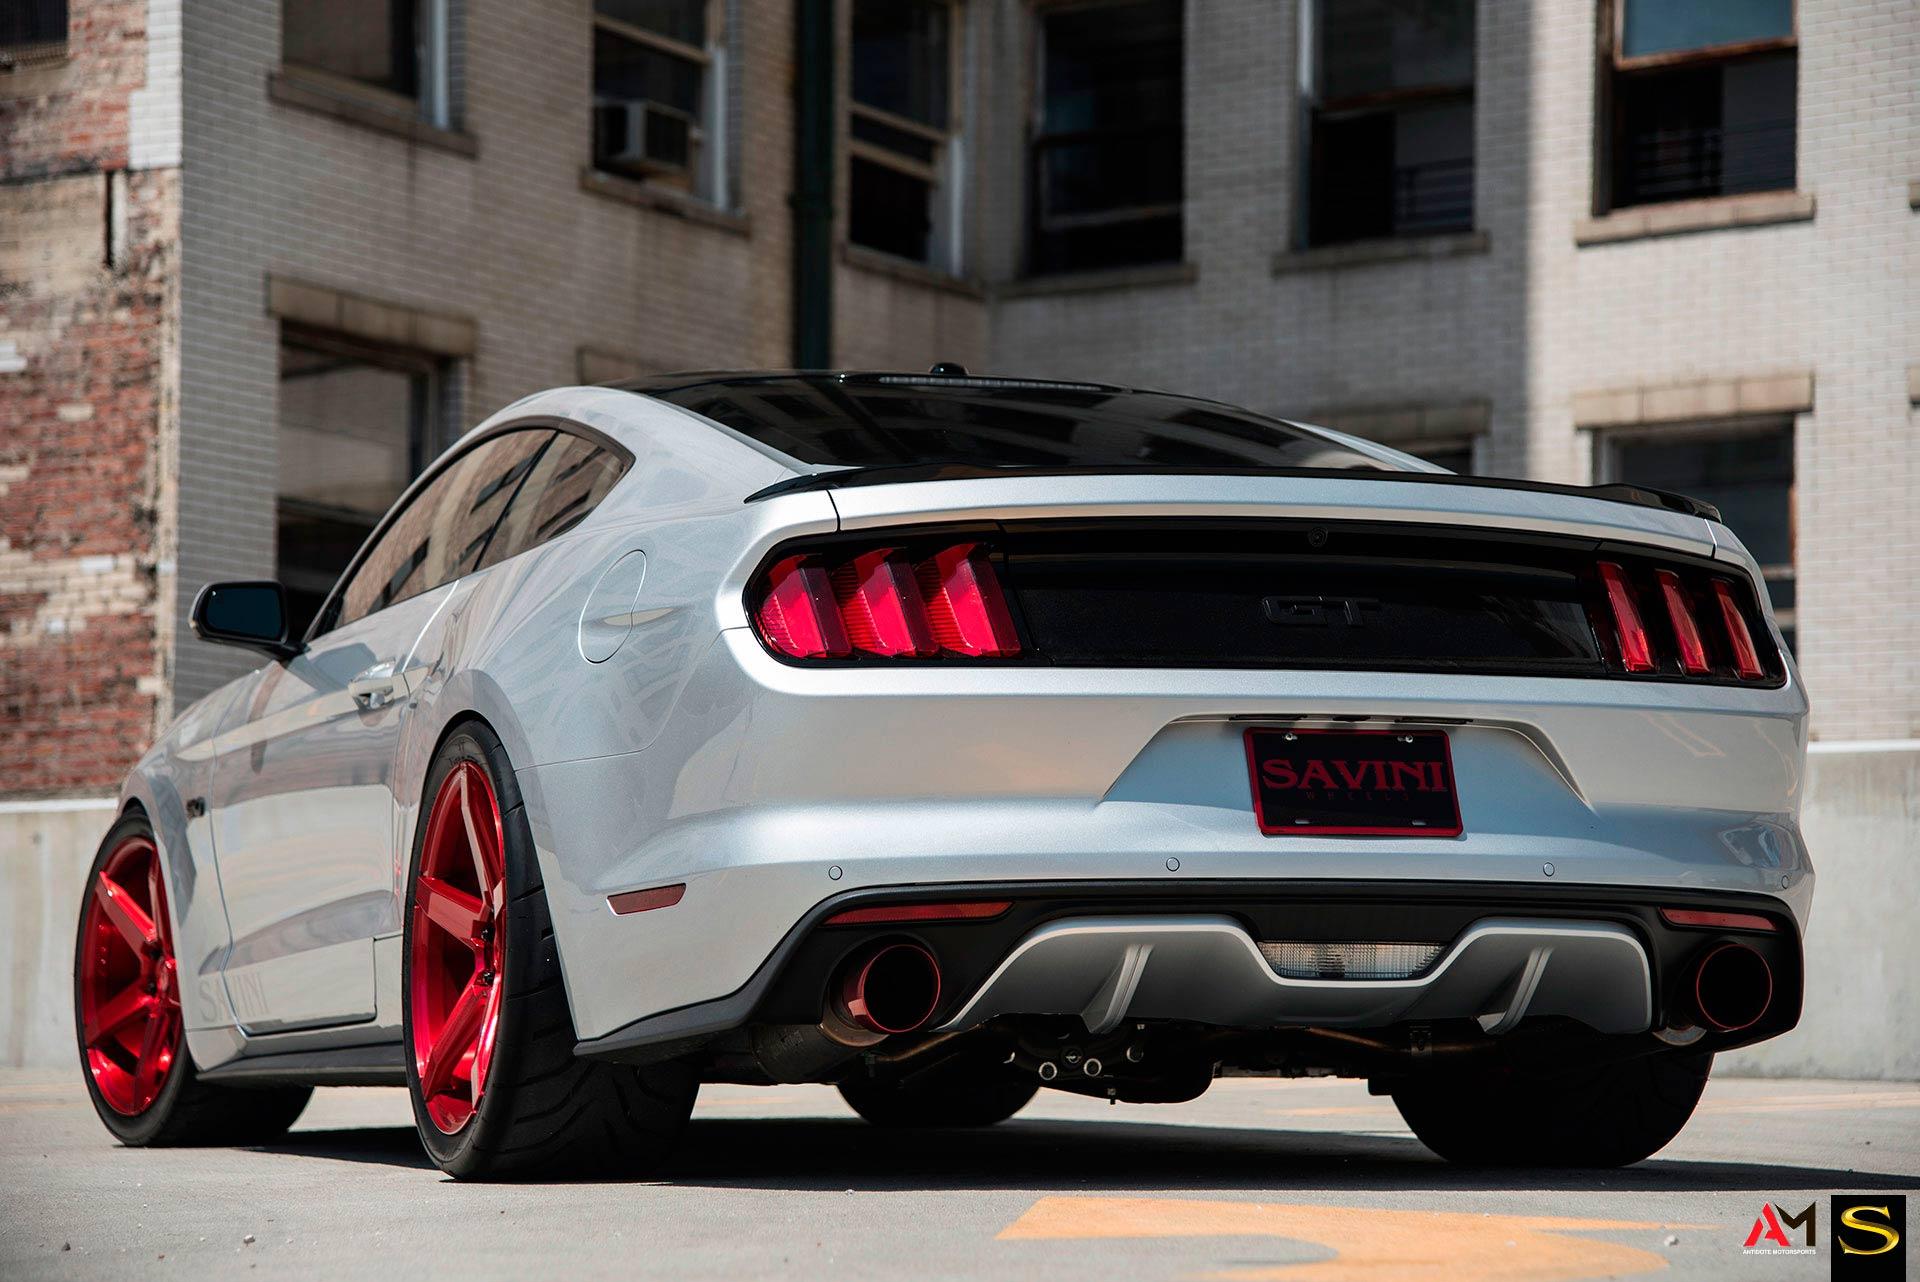 savini-wheels-black-di-forza-bm11-brushed-red-ford-mustang-gt-10